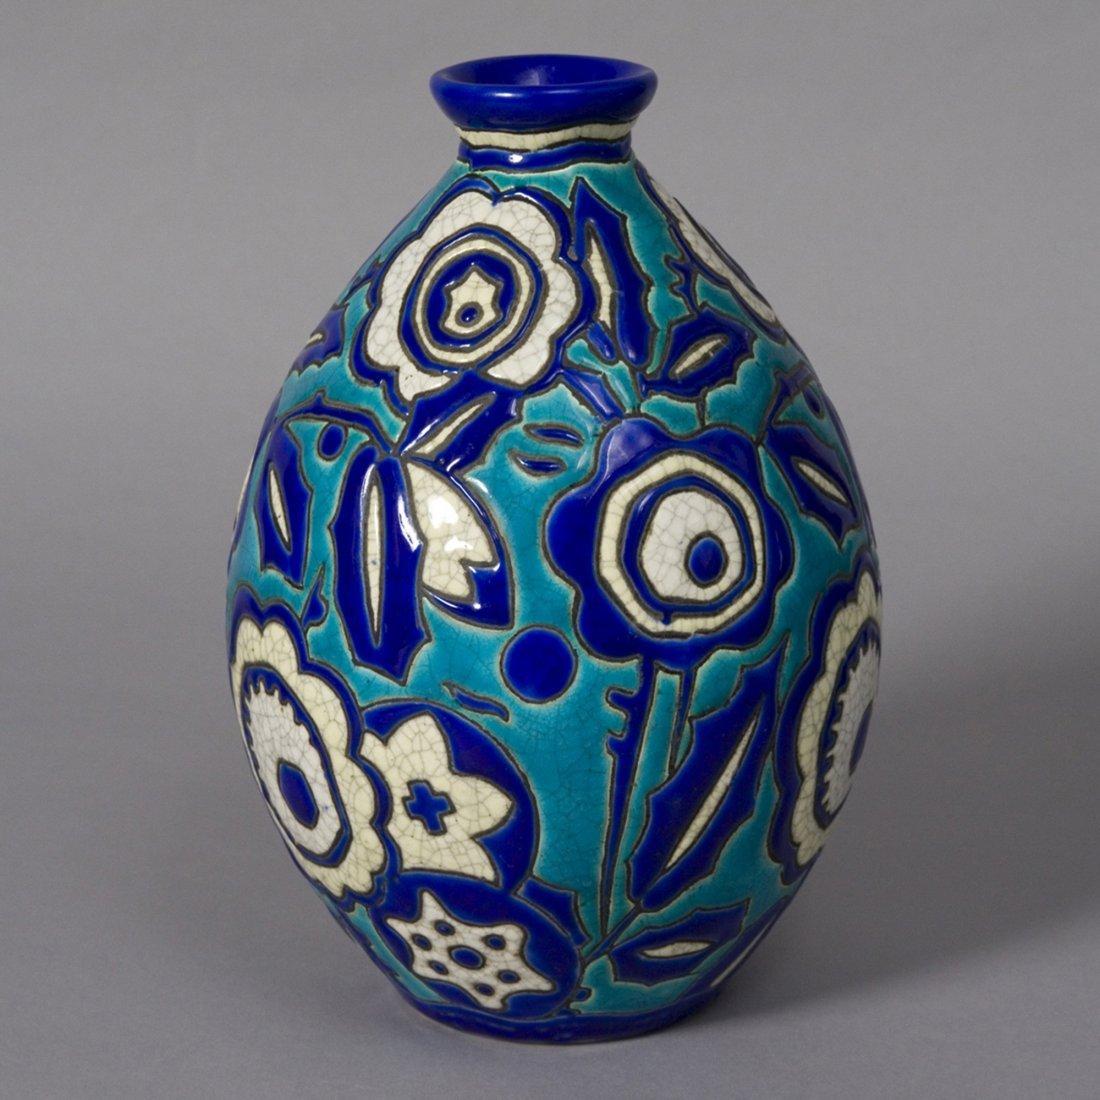 Ceramic Vase by Keramis